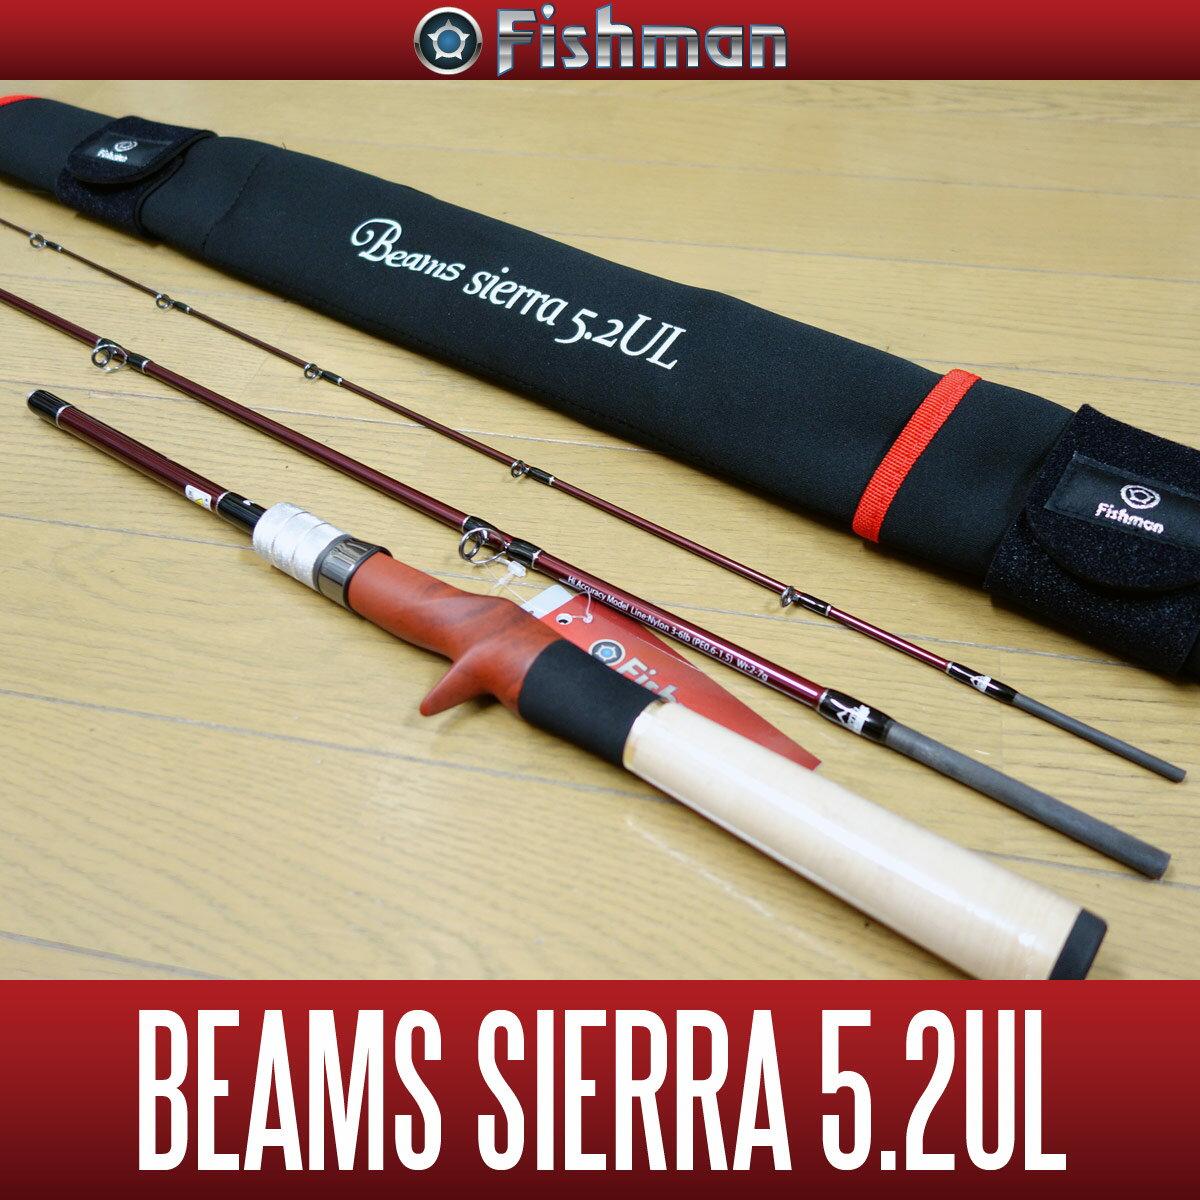 [Fishman/フィッシュマン] ★新製品★Beams blancsierra ブランシエラ 5.2UL